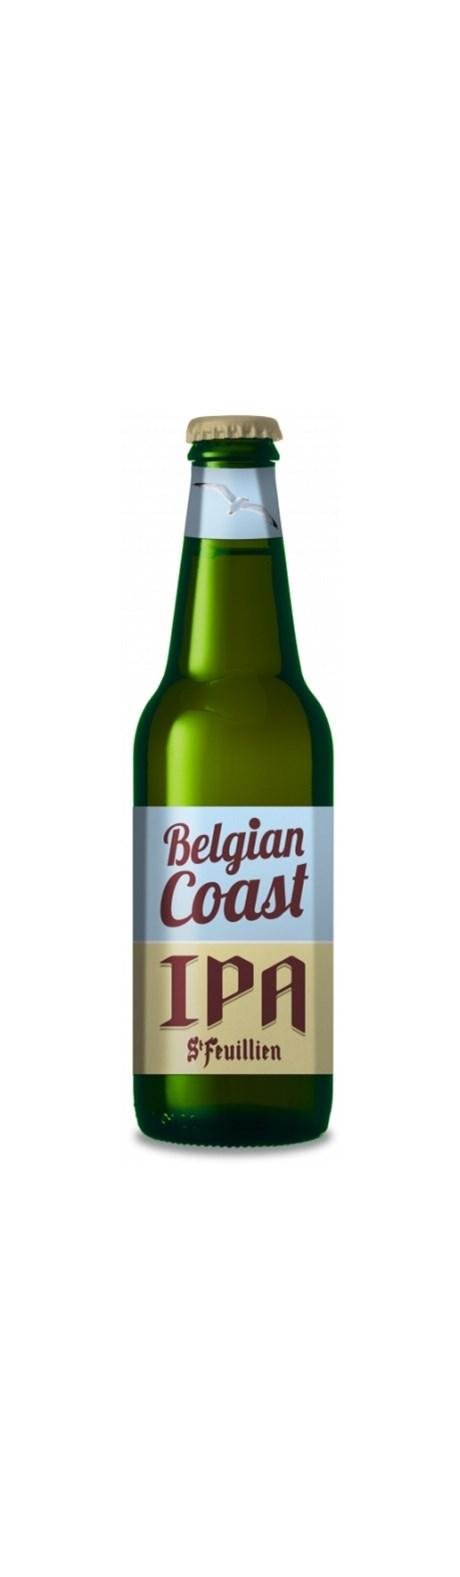 St. Feuillien Belgian Coast IPA